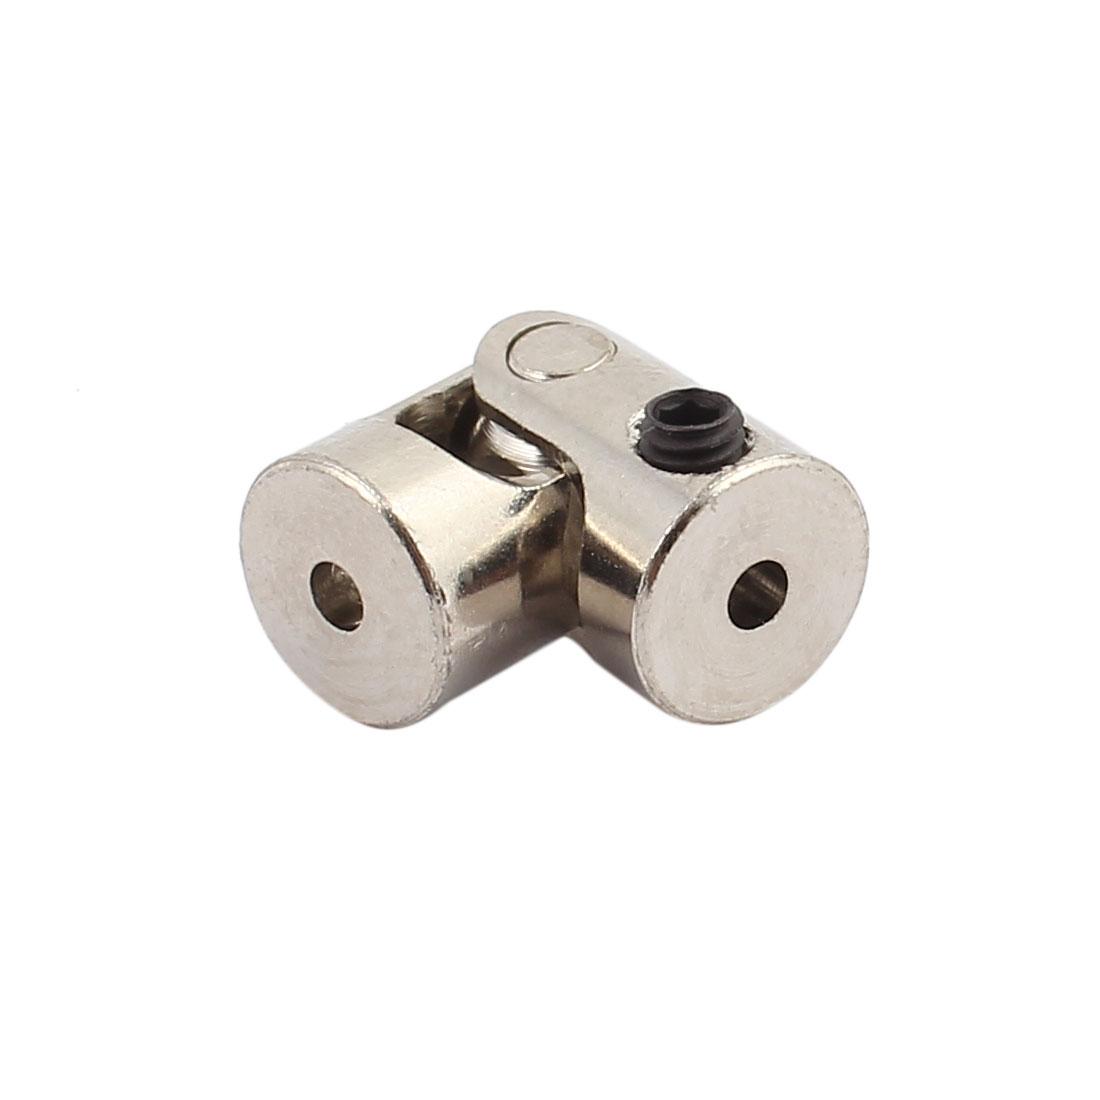 2pcs 2.0mm to 2.0mm Inner Diameter Rotatable Universal Steering Shaft U Joint - image 1 de 2